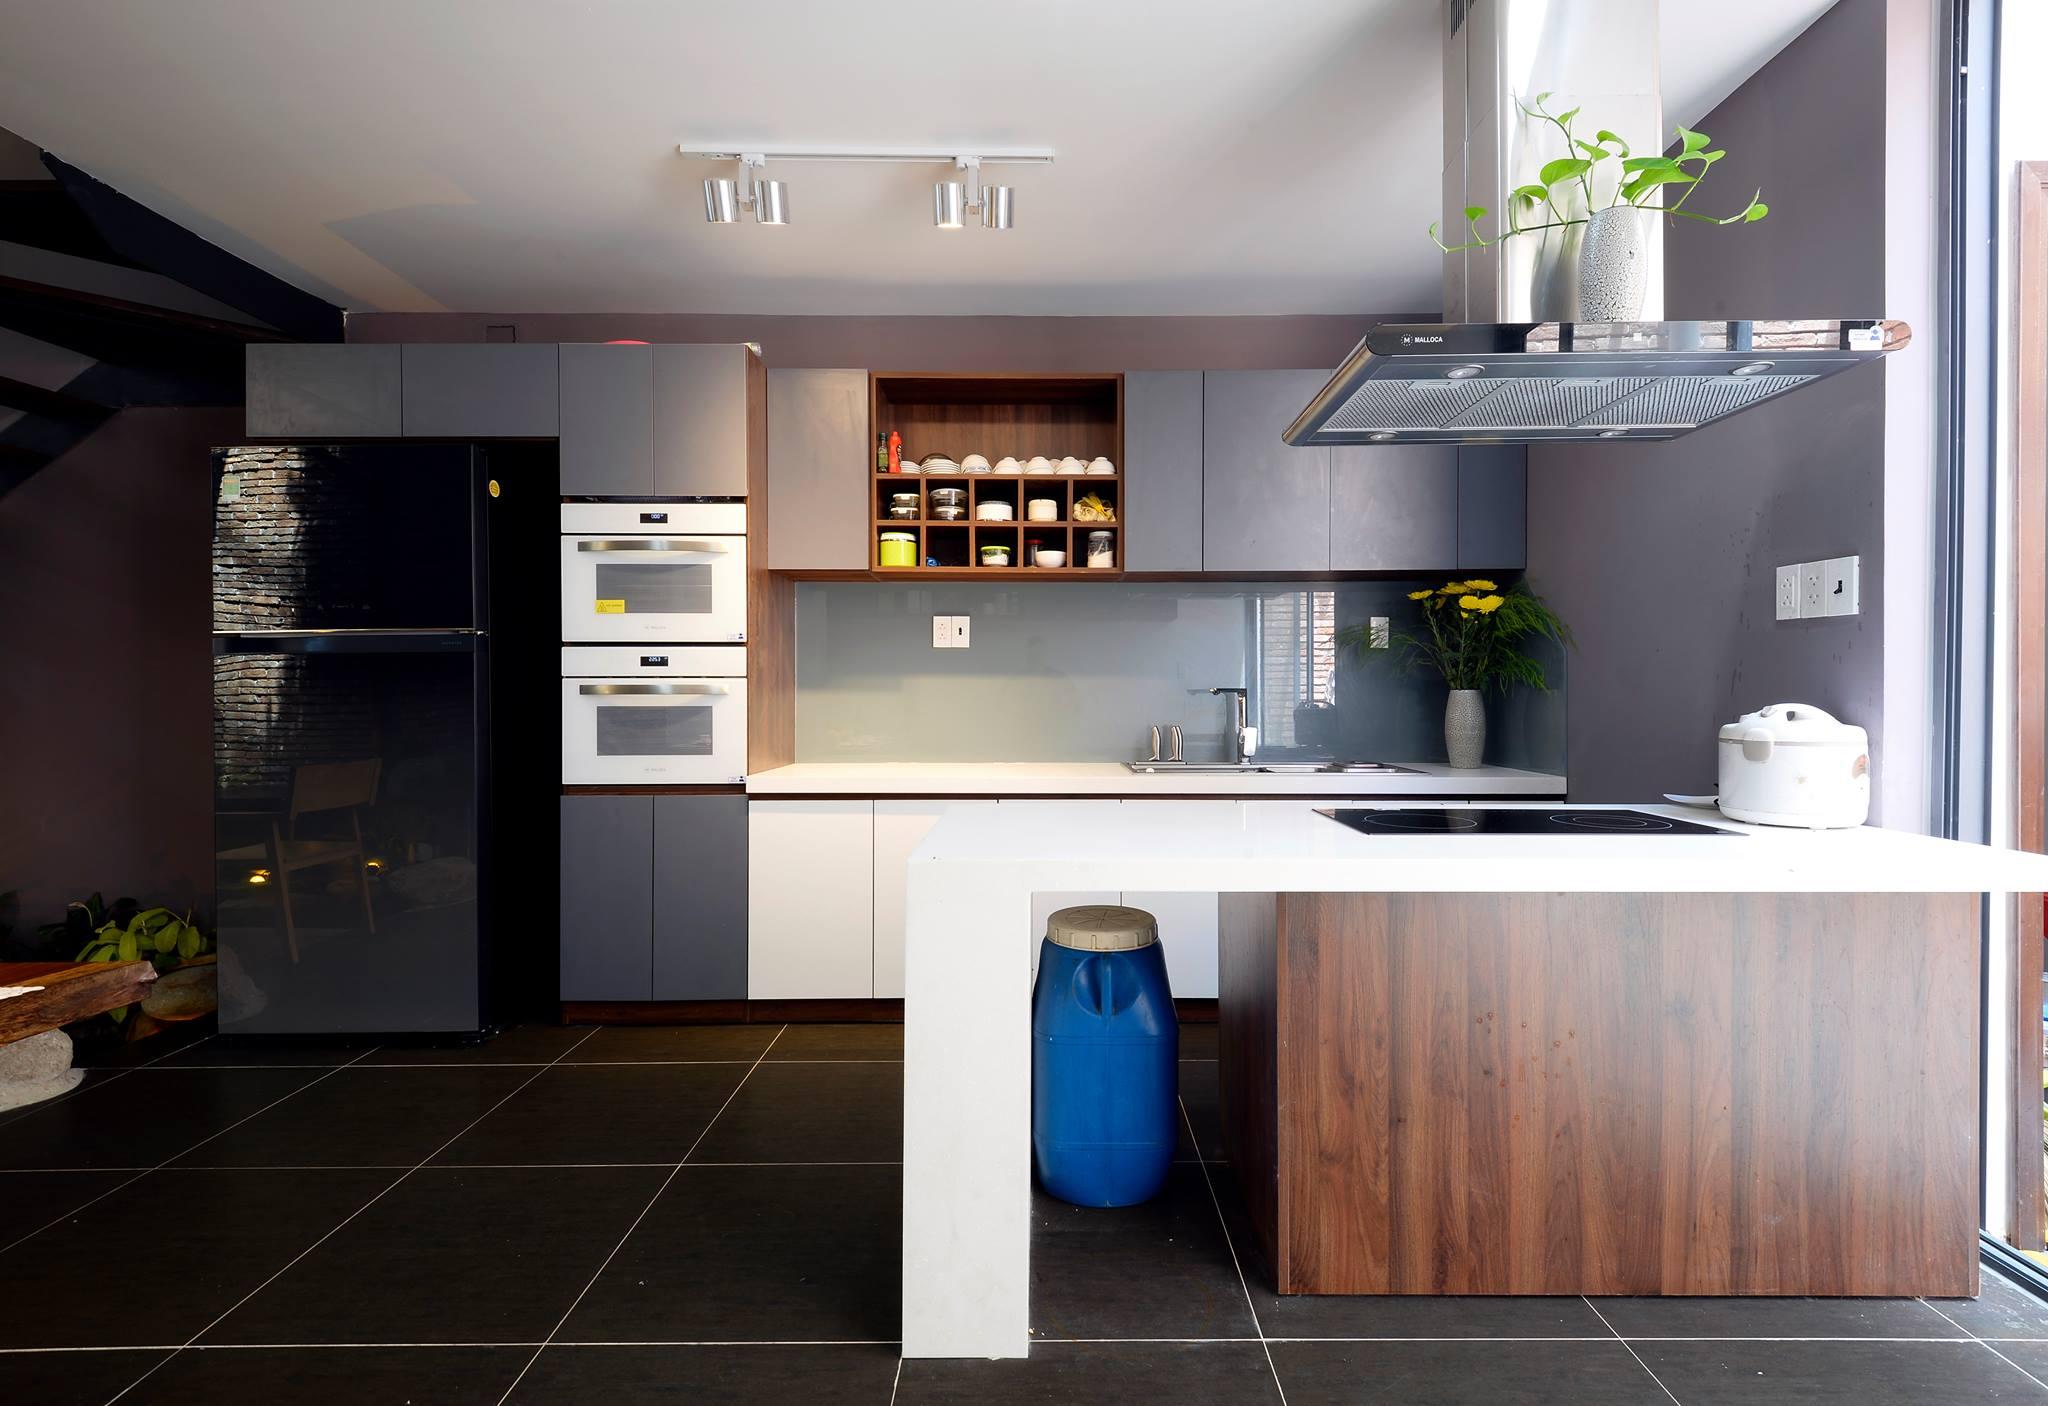 Nội thất bếp 2